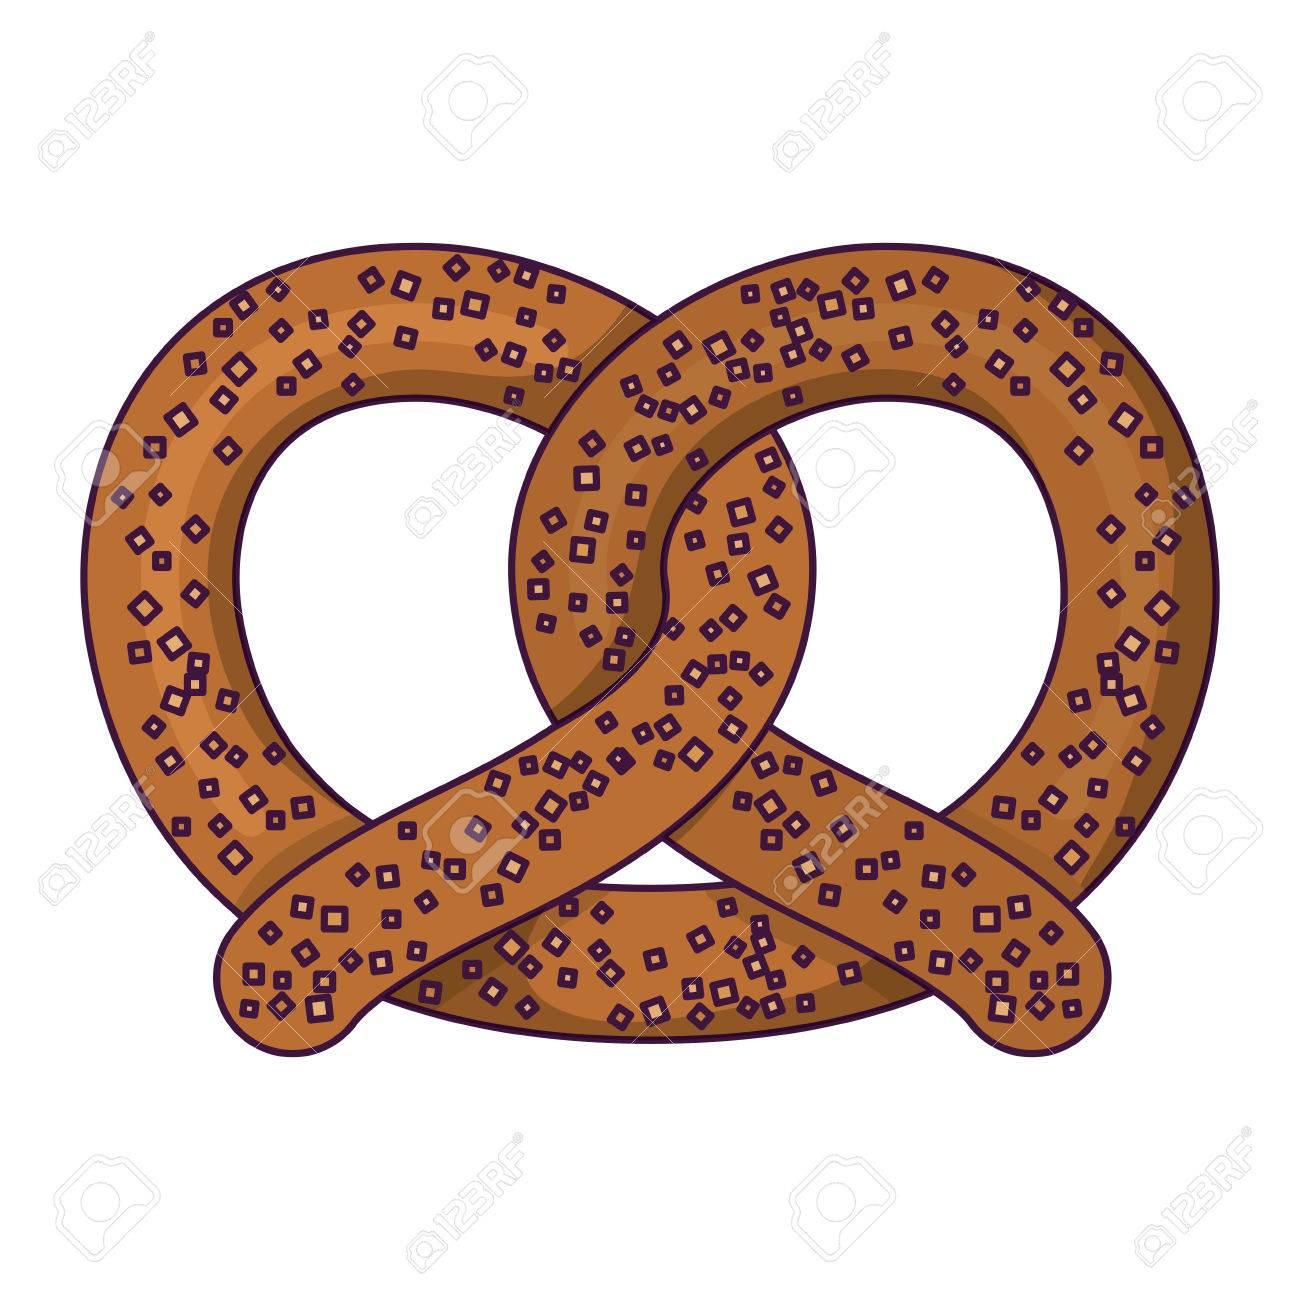 pretzel bread icon oktoberfest germany culture festival and